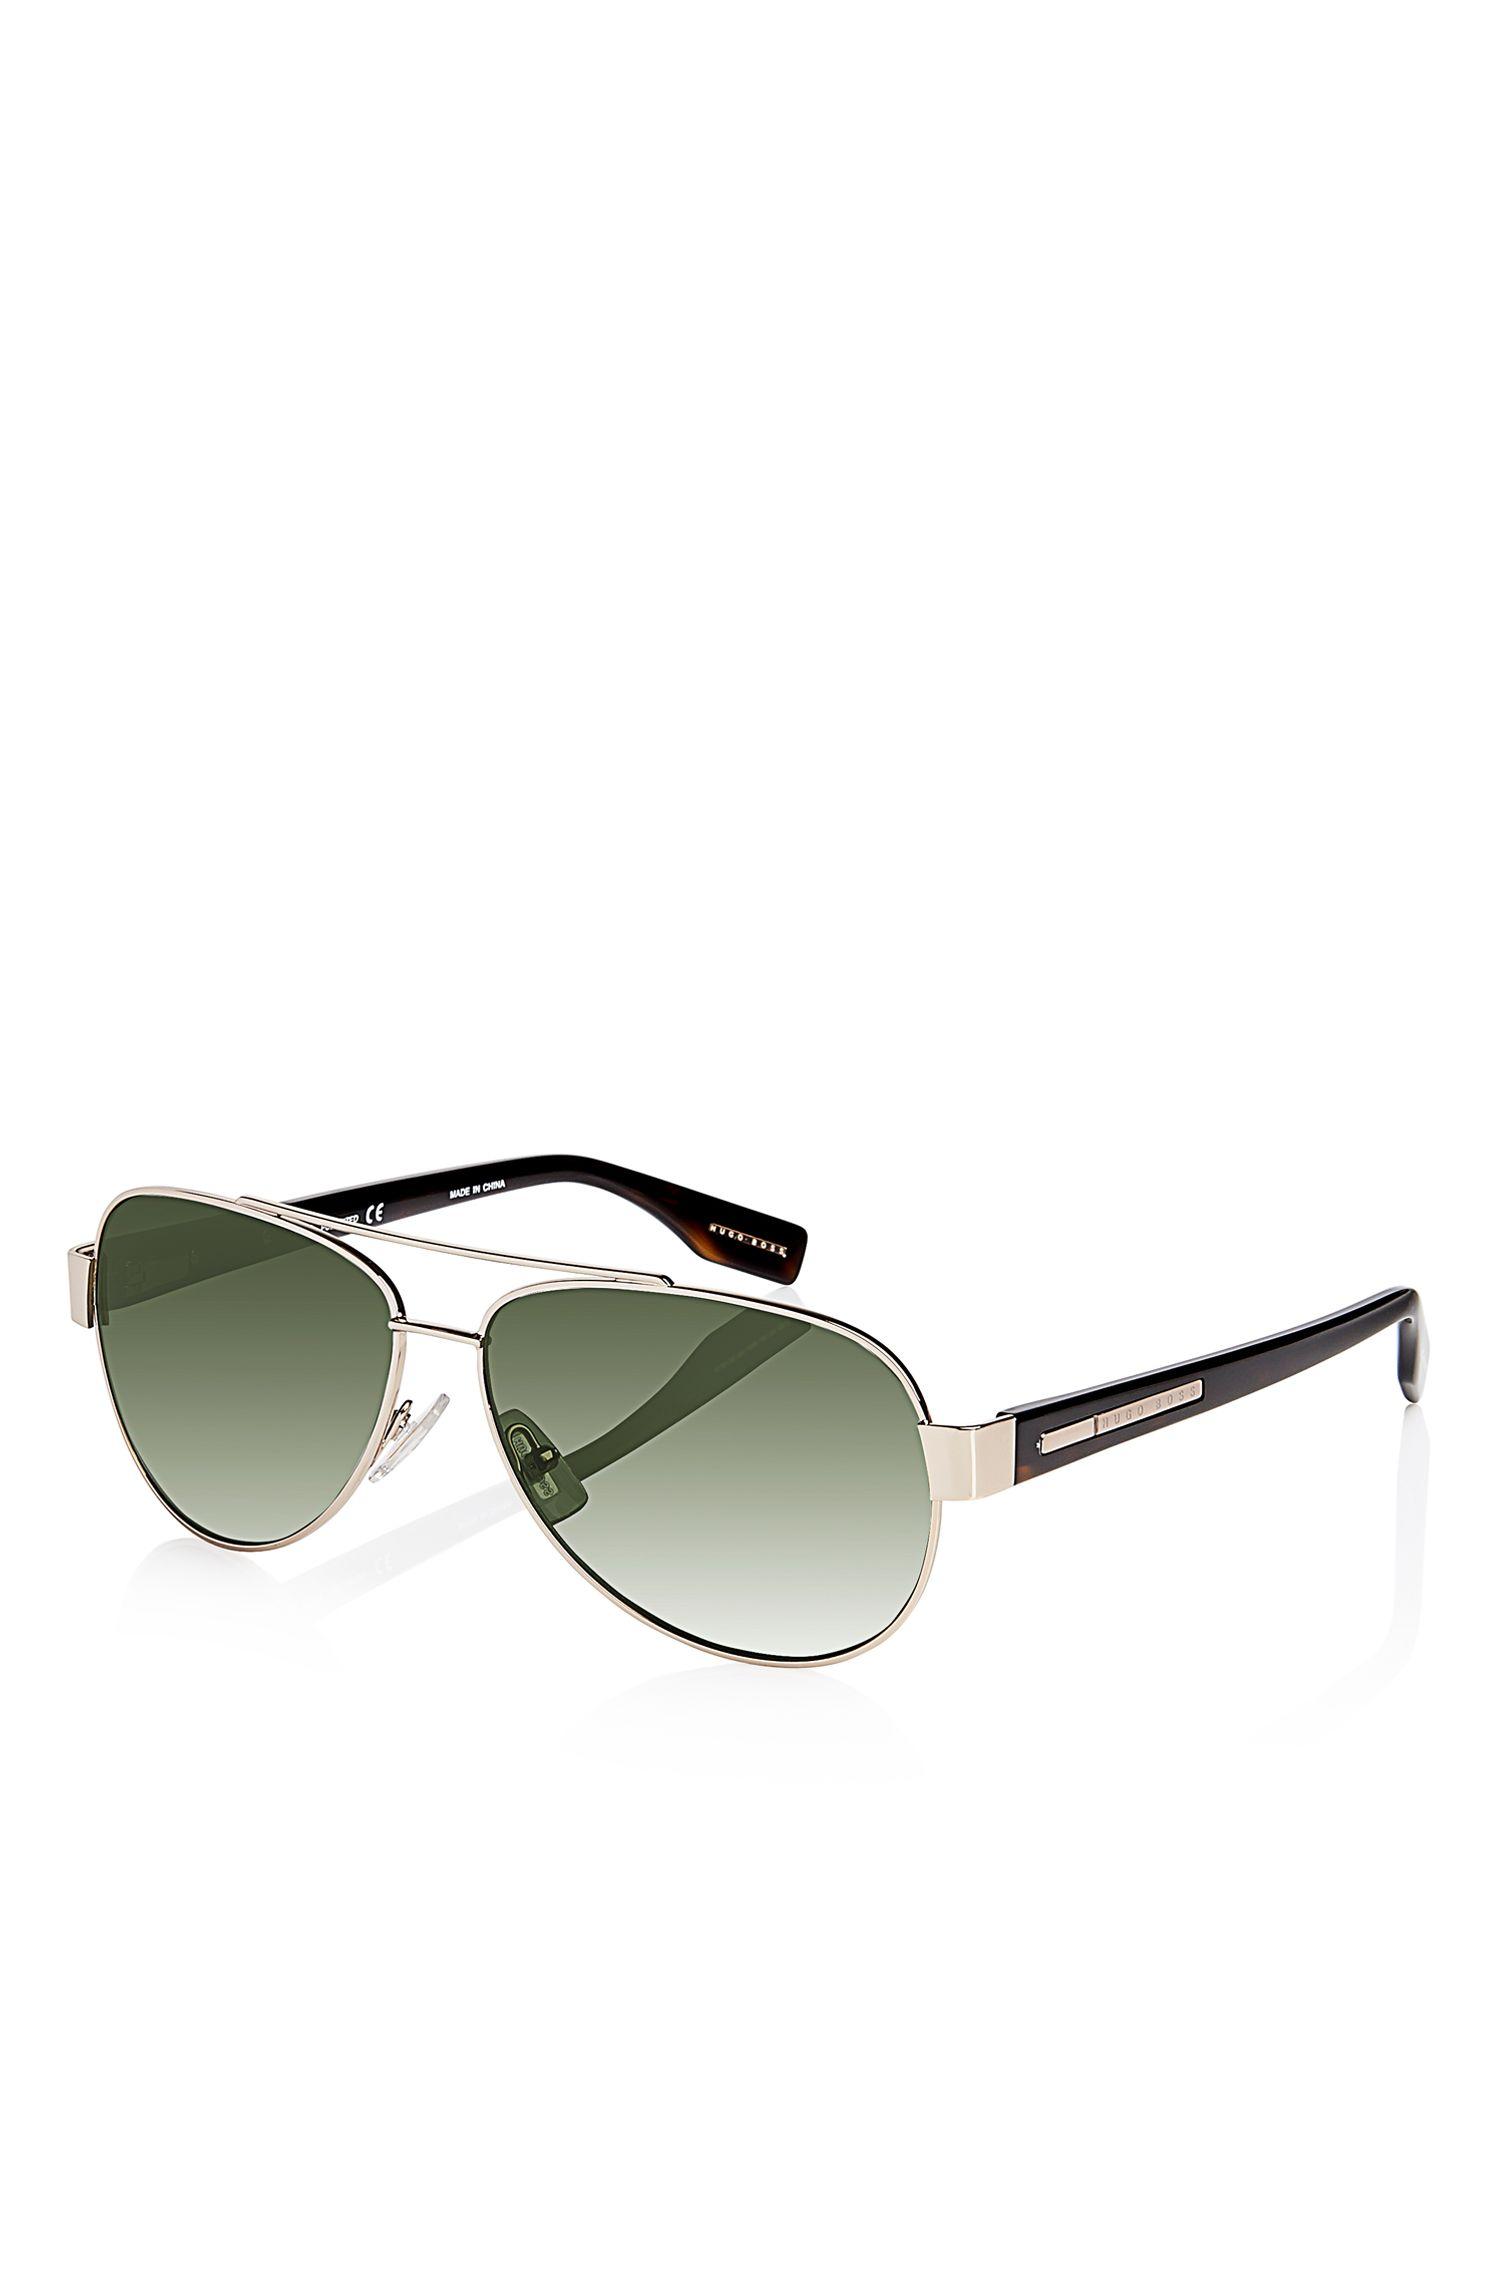 'Sunglasses' | Light Gold Metal Aviator Sunglasses